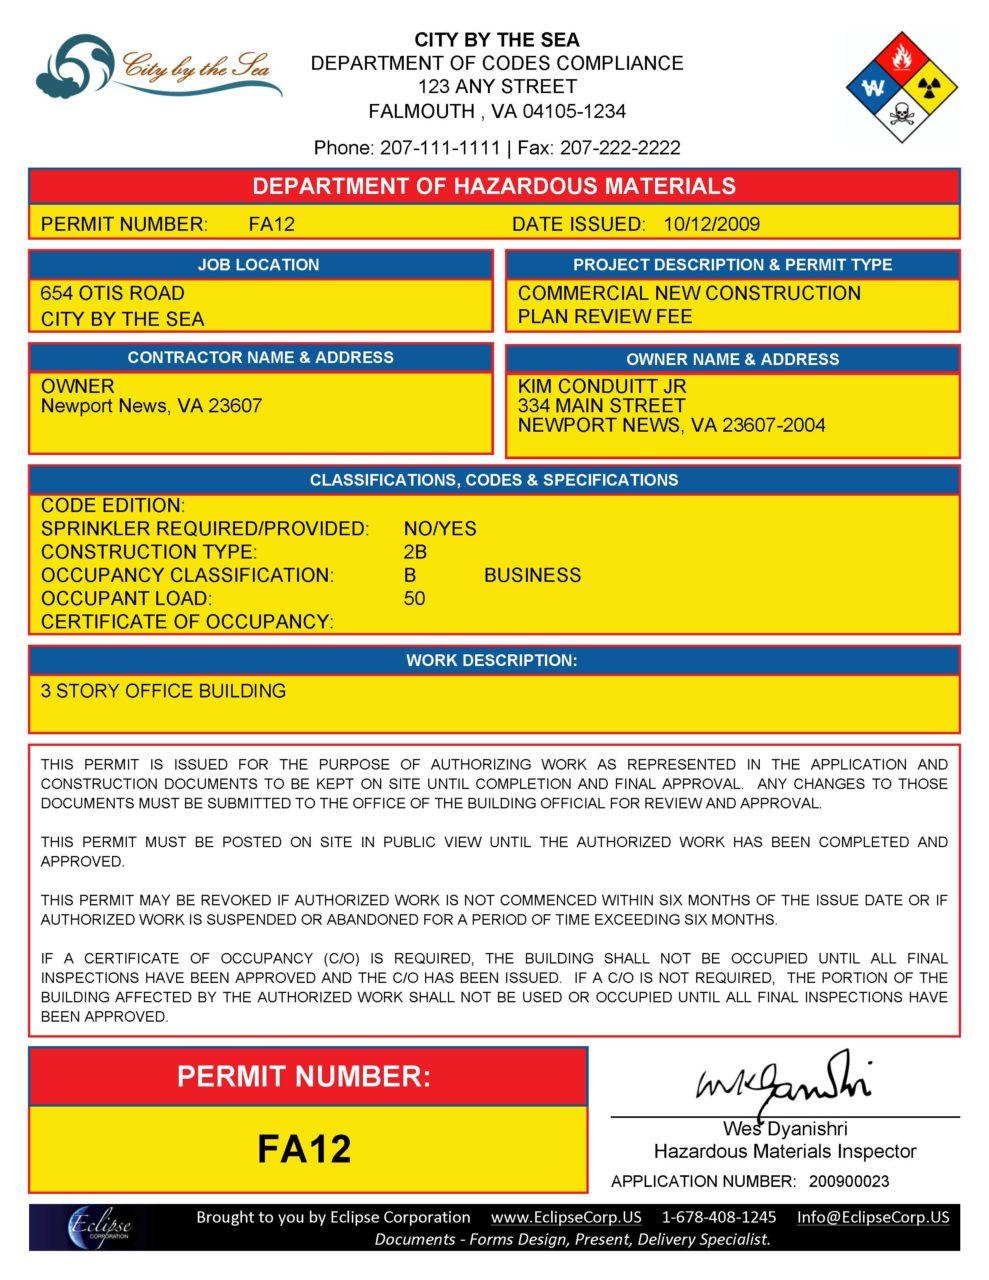 Sample Municipal Hazardous Materials Permit